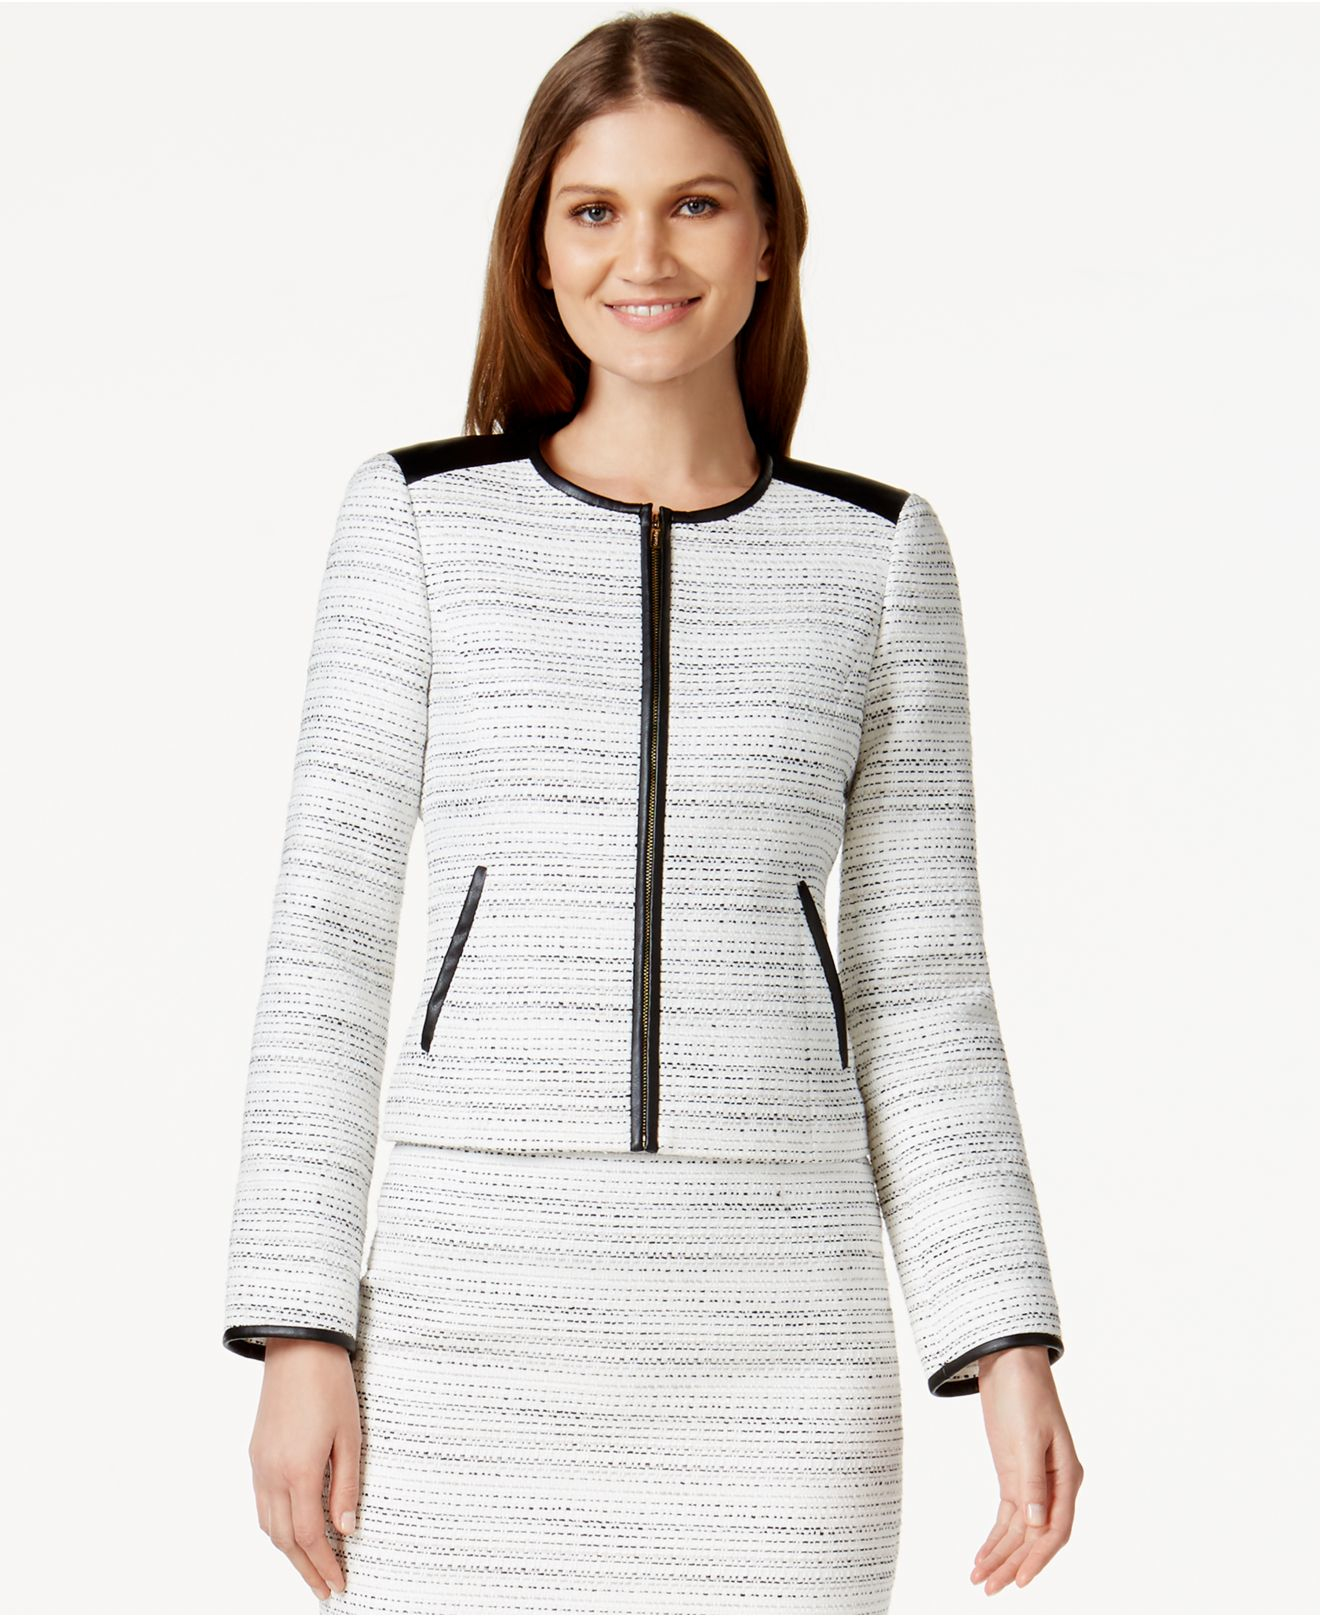 Calvin klein Petite Faux-leather-trim Tweed Jacket in White | Lyst